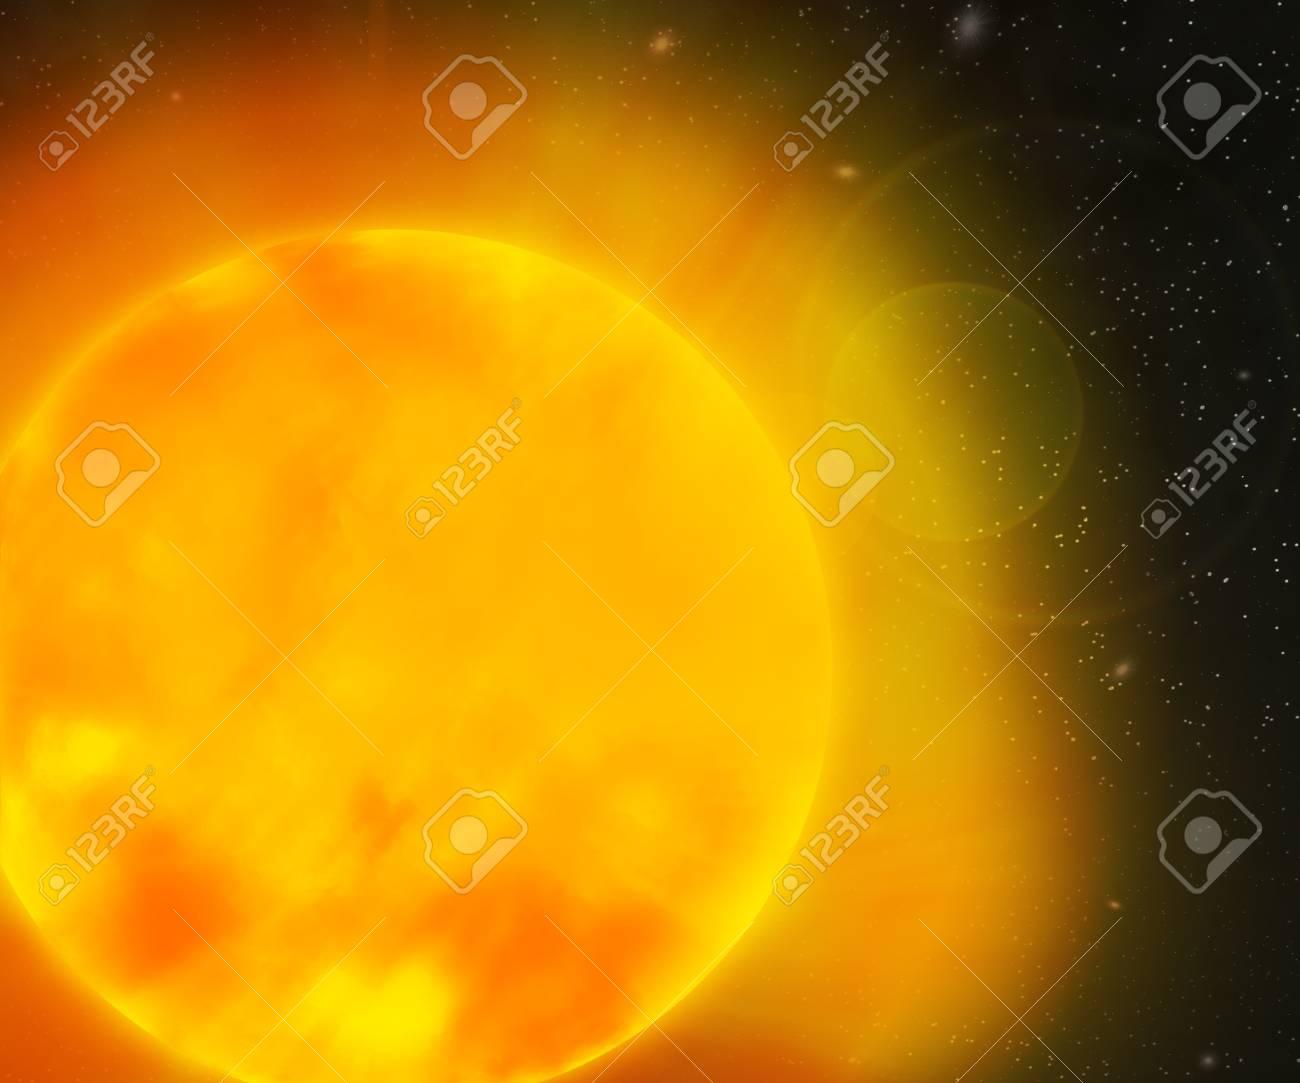 Sun Nebula Space Backdrop Stock Photo - 21138494